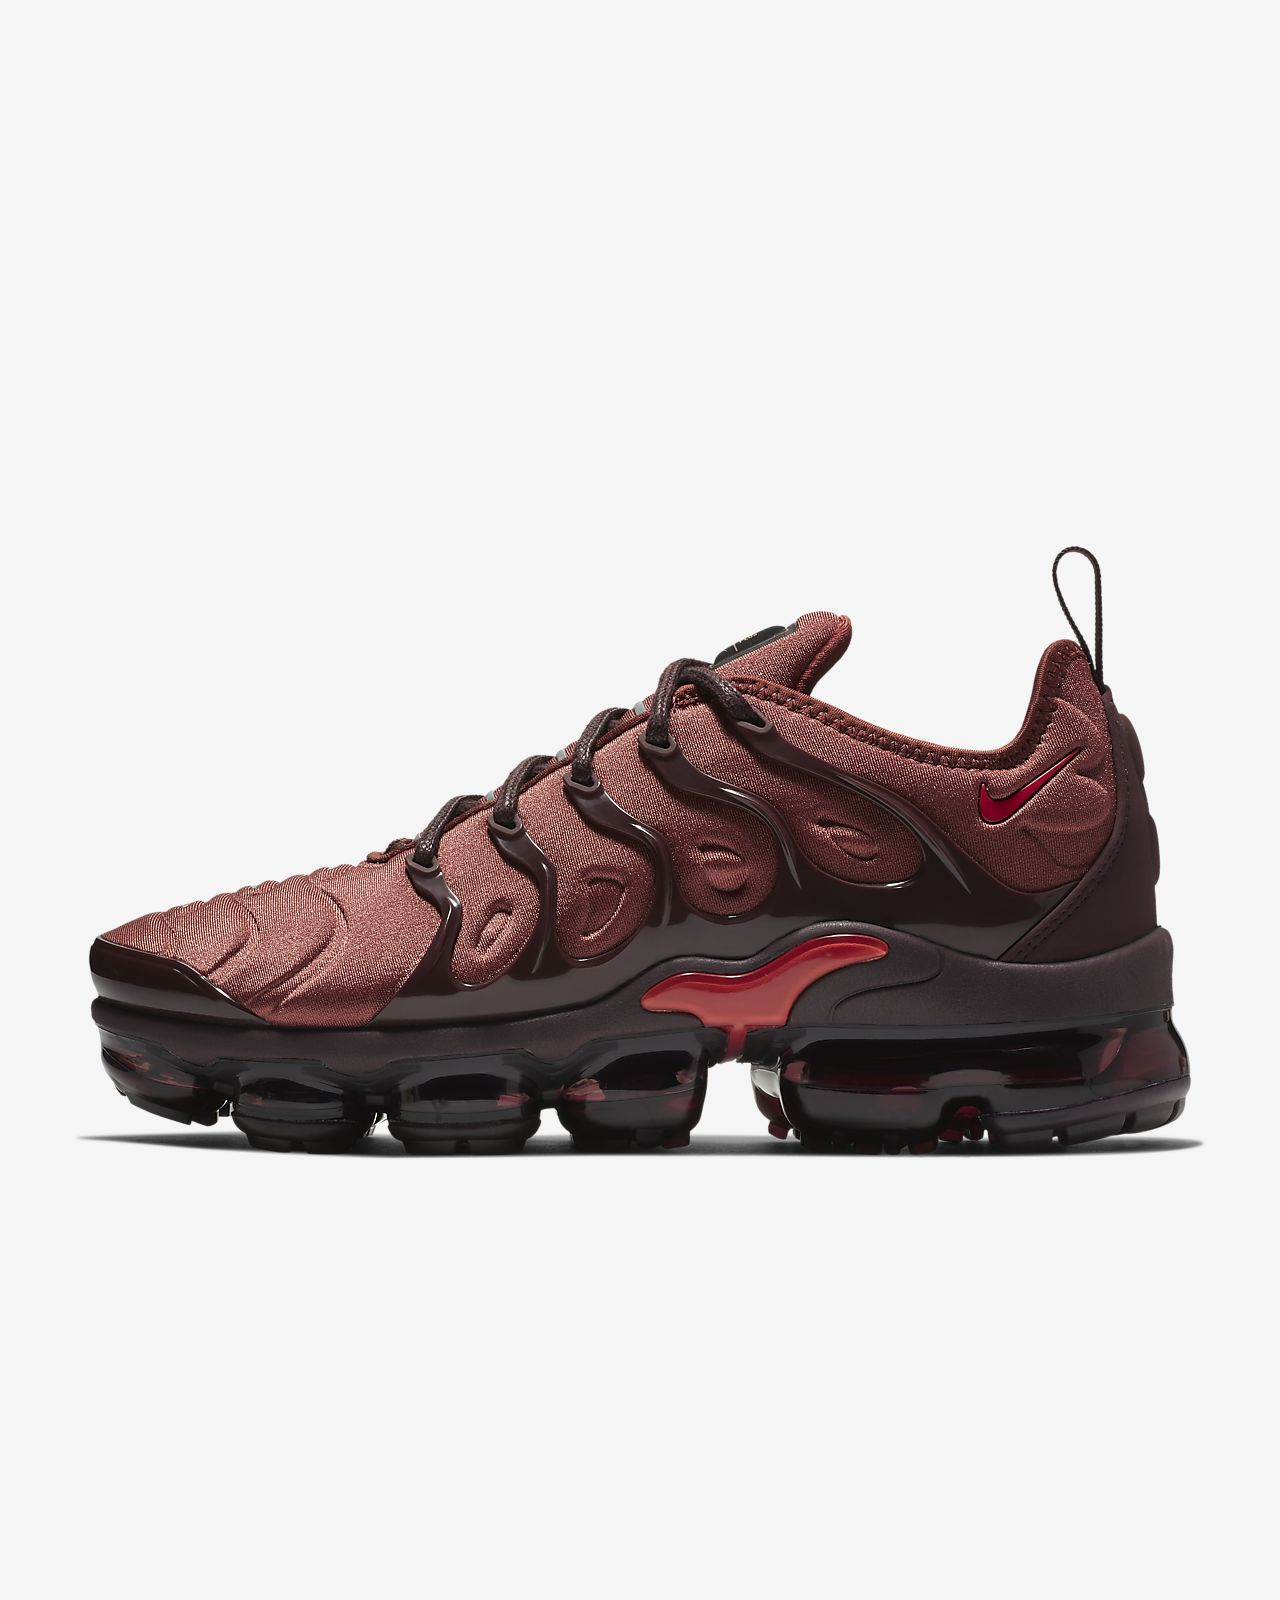 25a53d891 ... sale nike air vapormax plus zapatillas mujer 7fd85 007e4